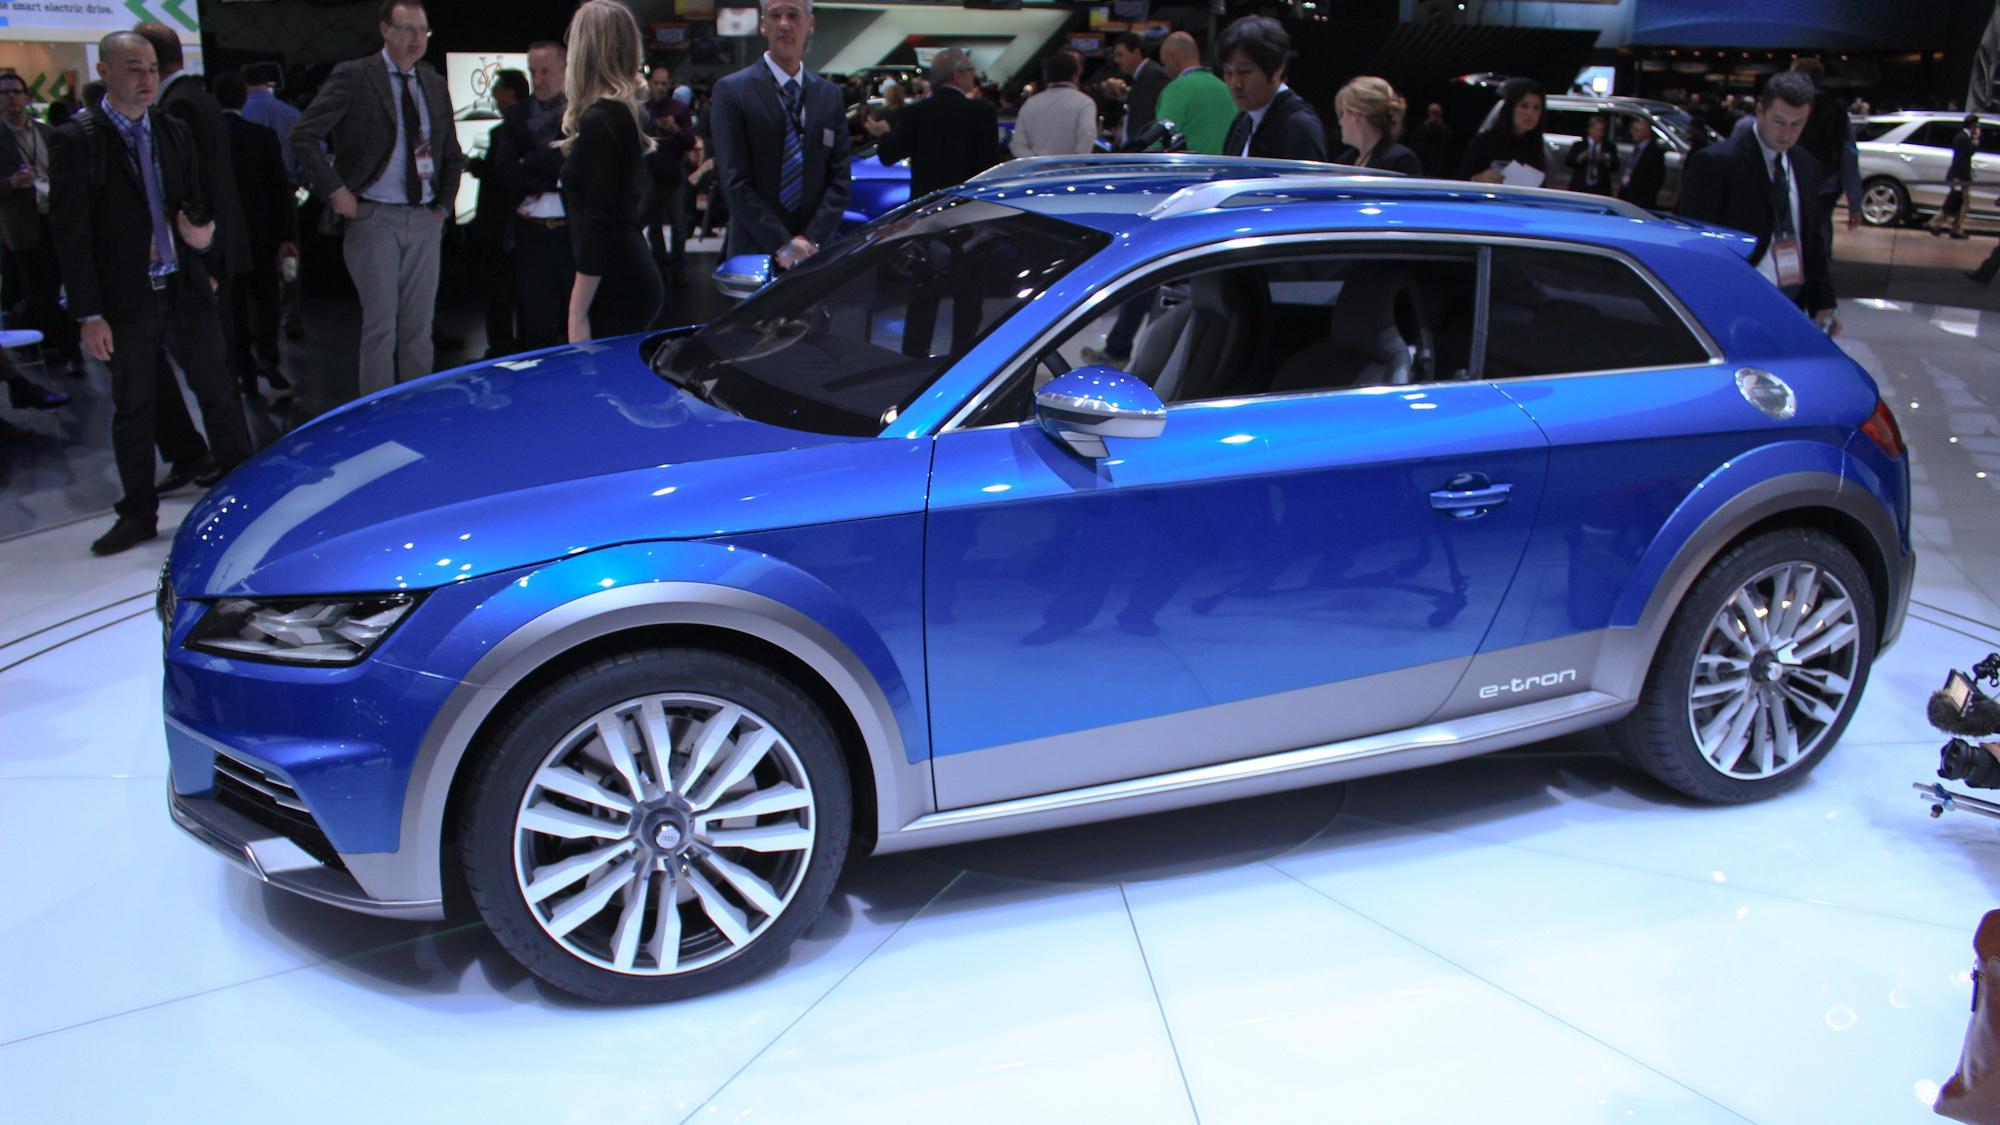 Audi Allroad Shooting Brake Concept live photos, 2014 Detroit Auto Show